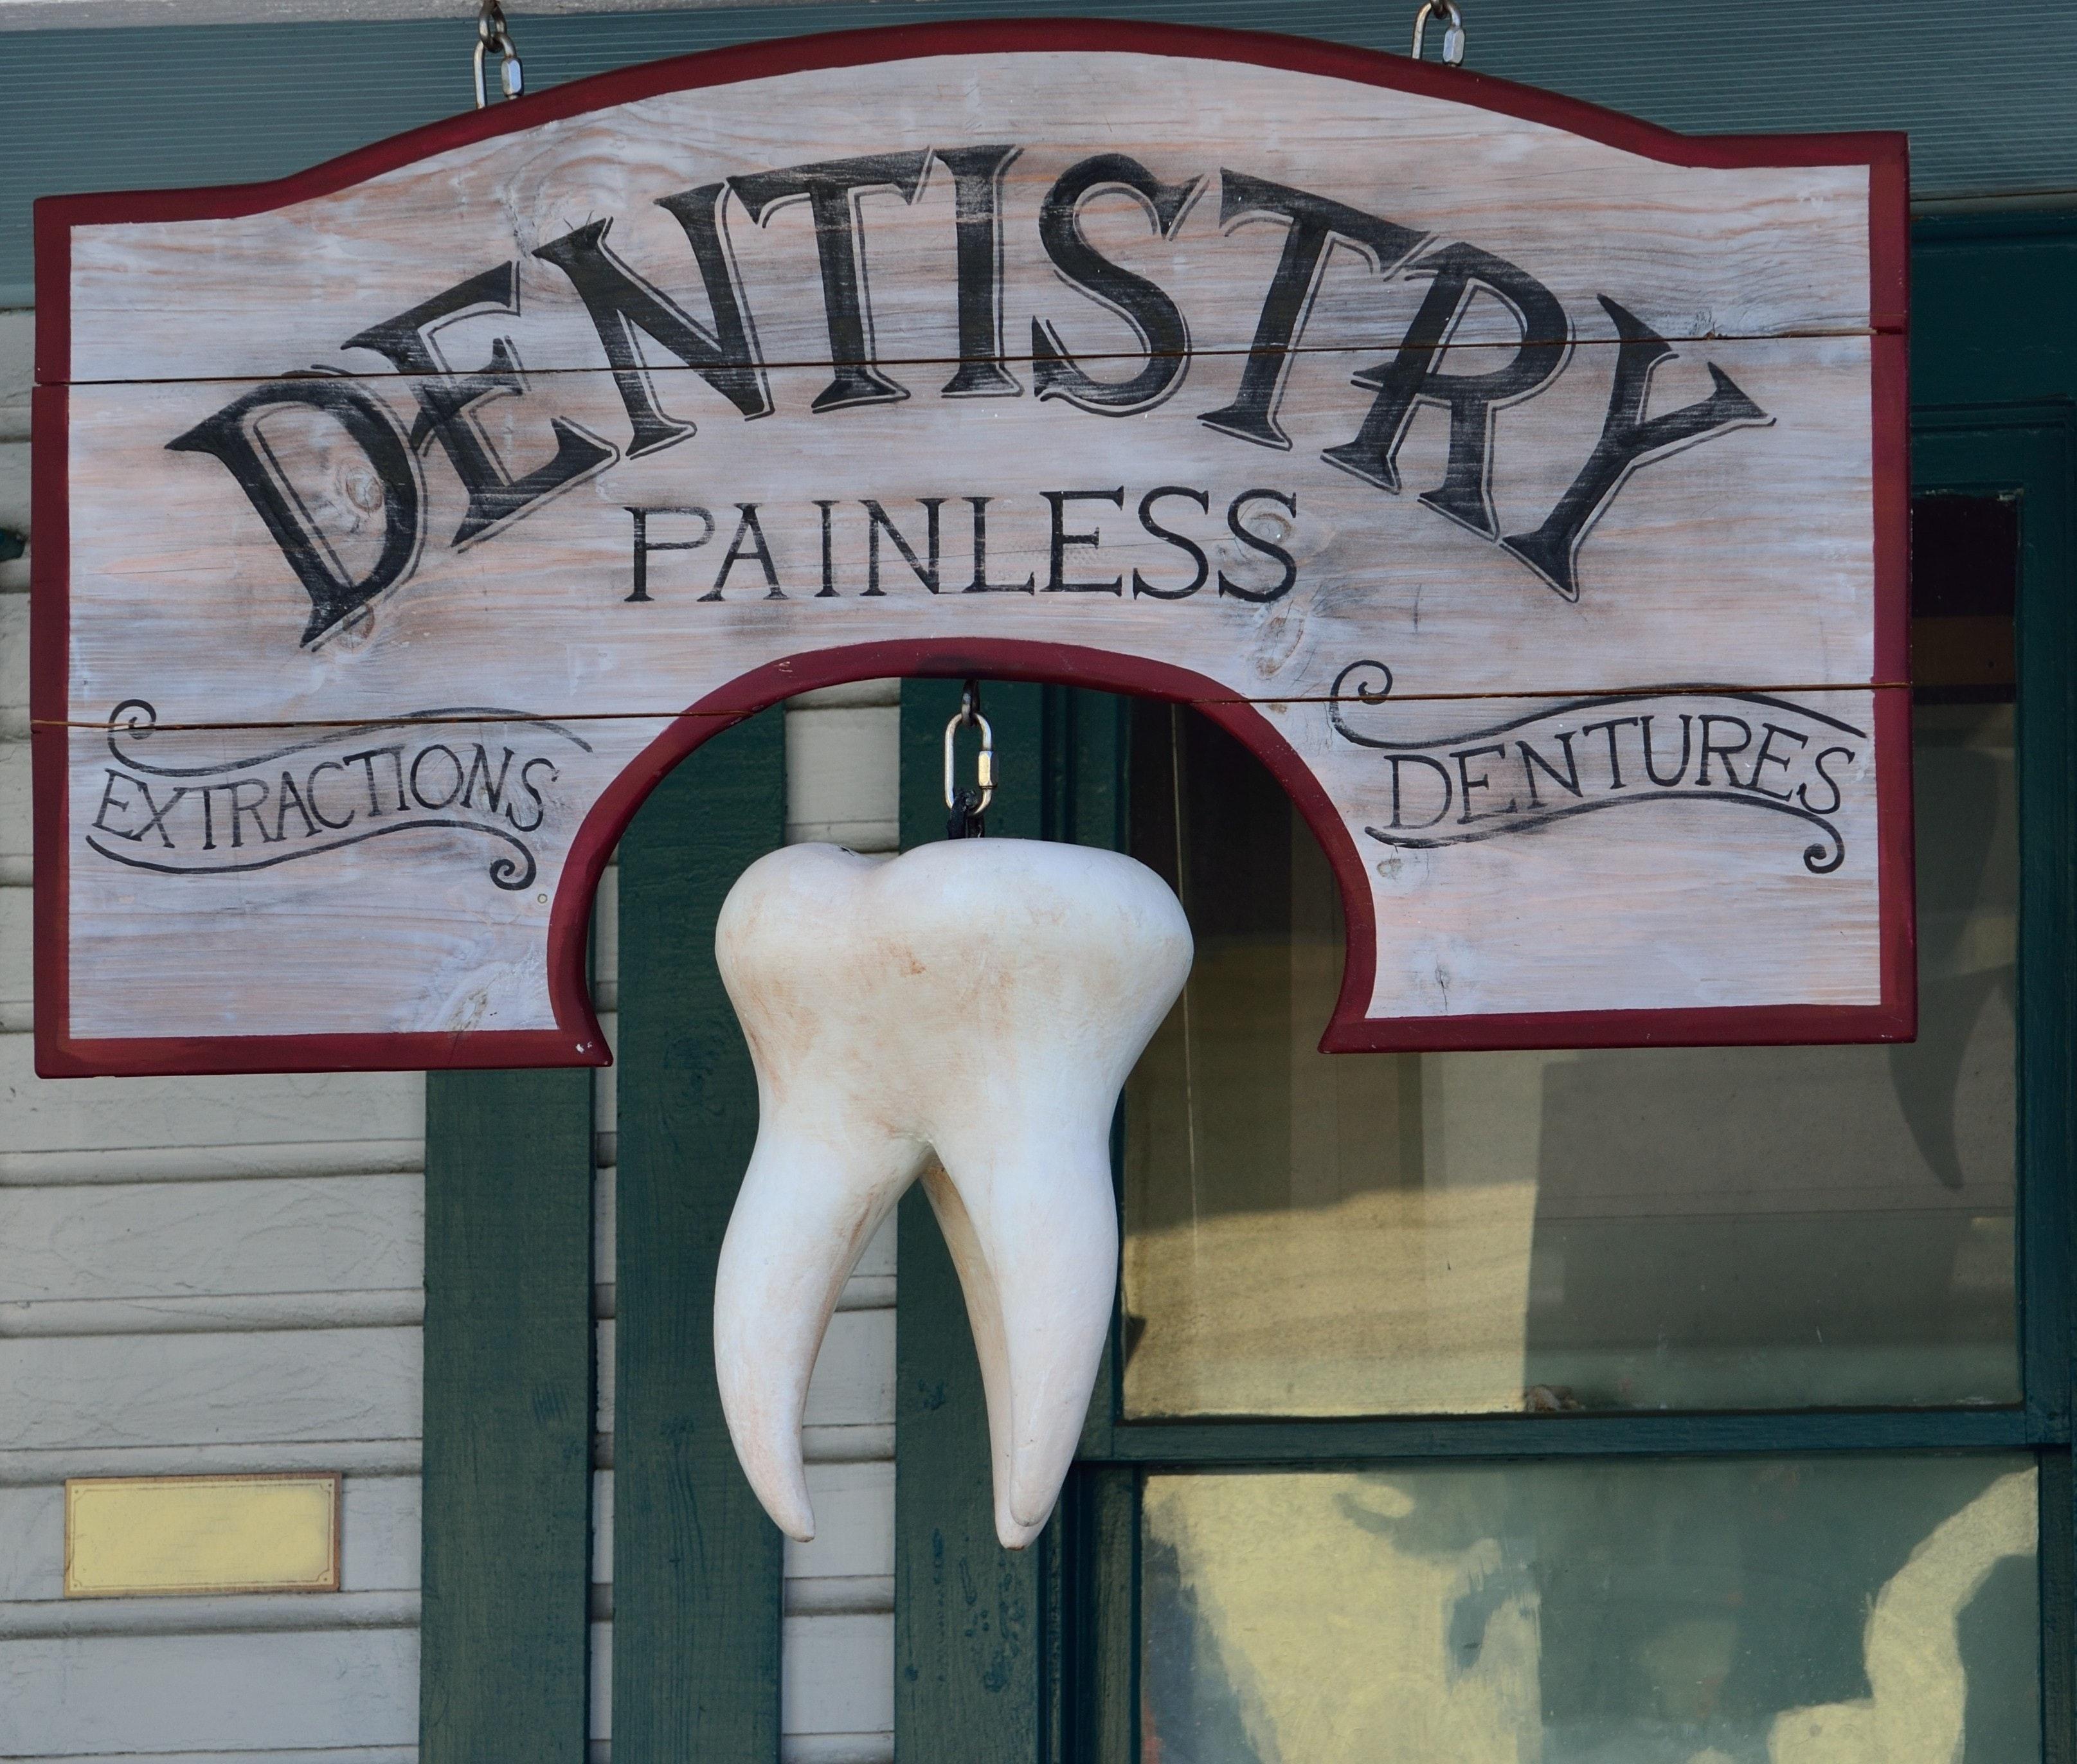 100 Beautiful Dental Care Photos Pexels Free Stock